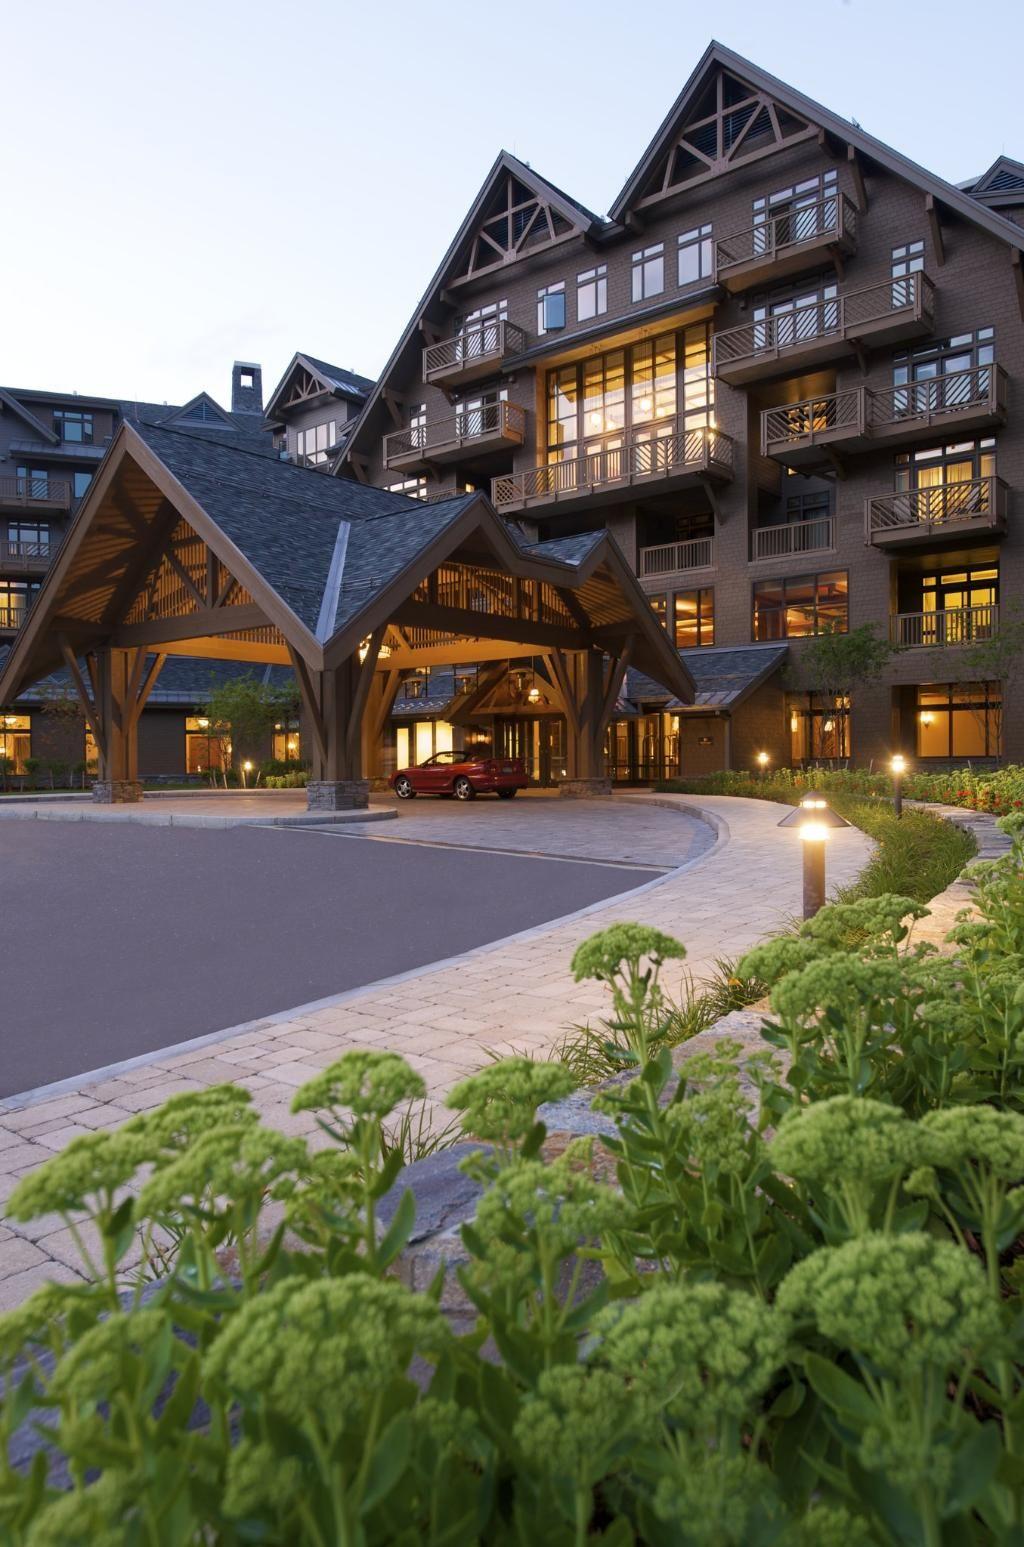 Stowe Mountain Lodge Vermont Hotel Reviews Tripadvisor With